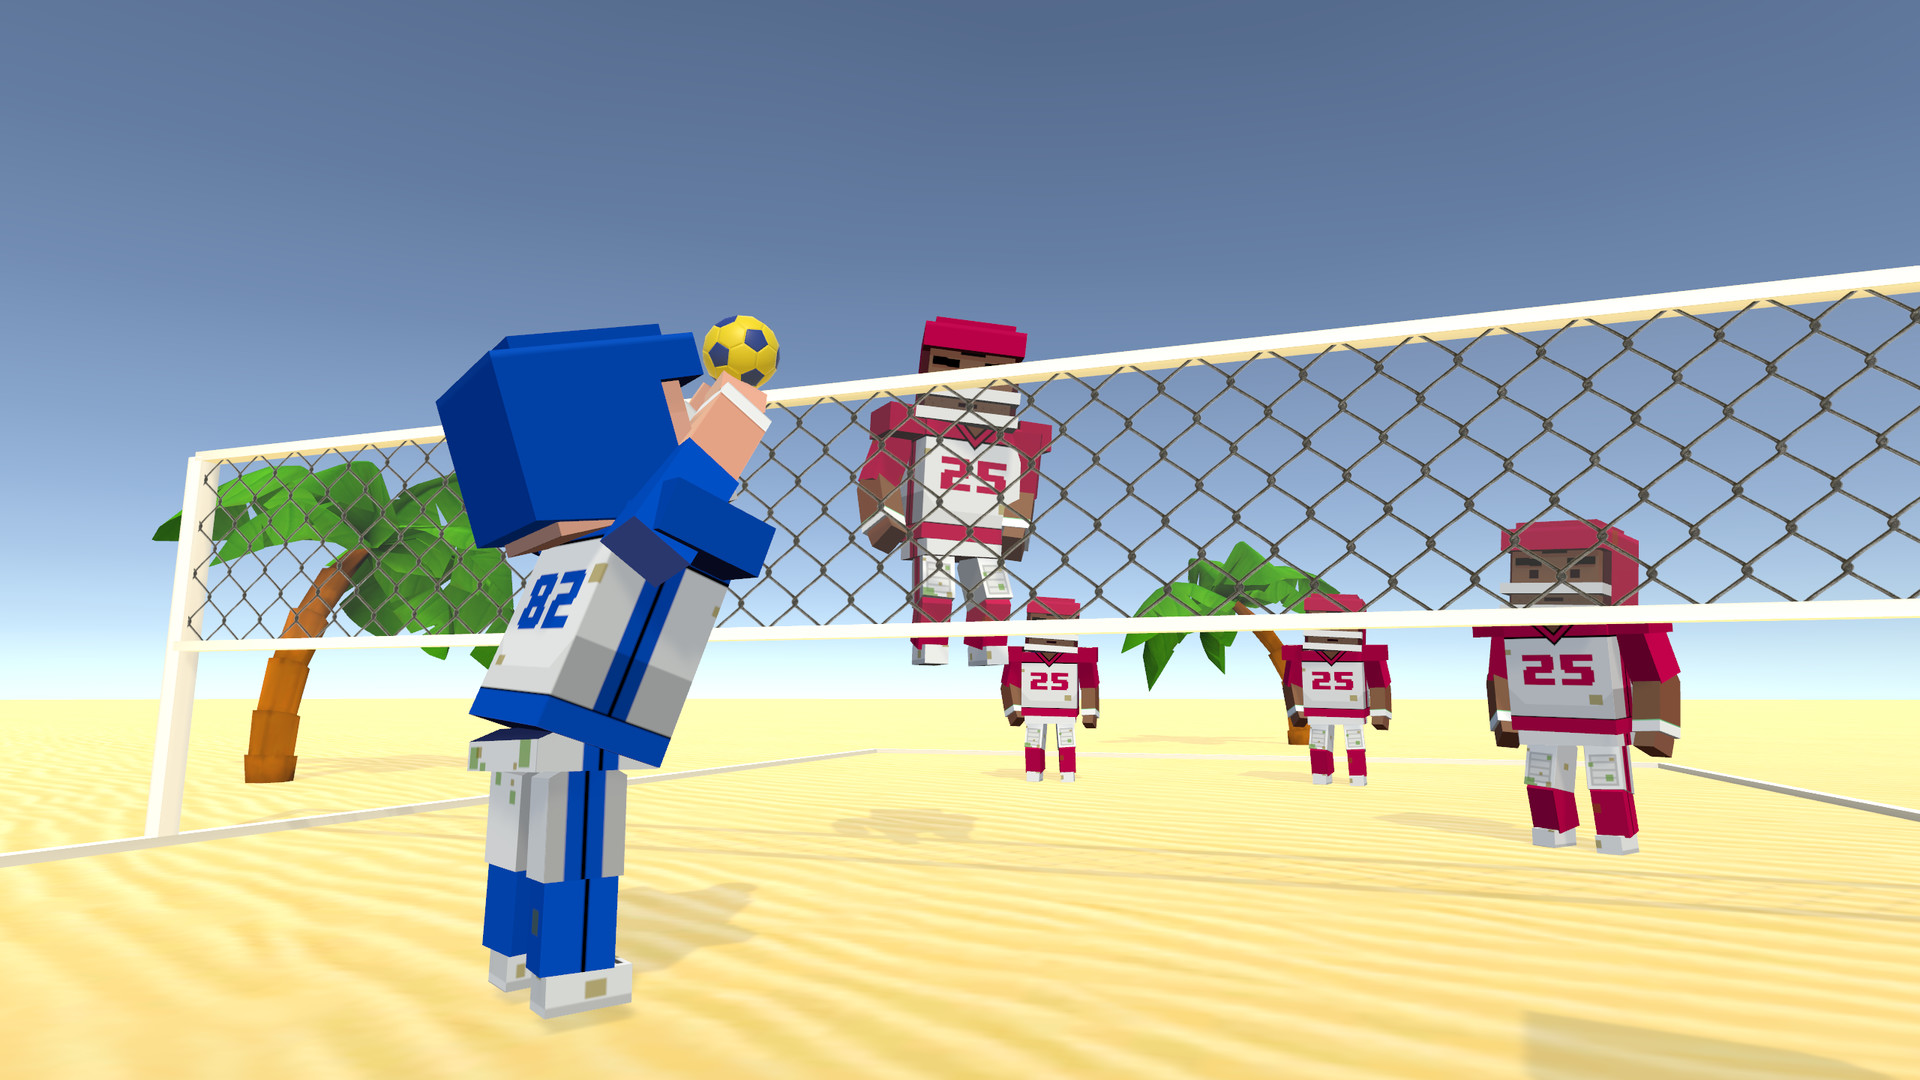 Oculus Quest 游戏《Volleyball Fever》狂热排球插图